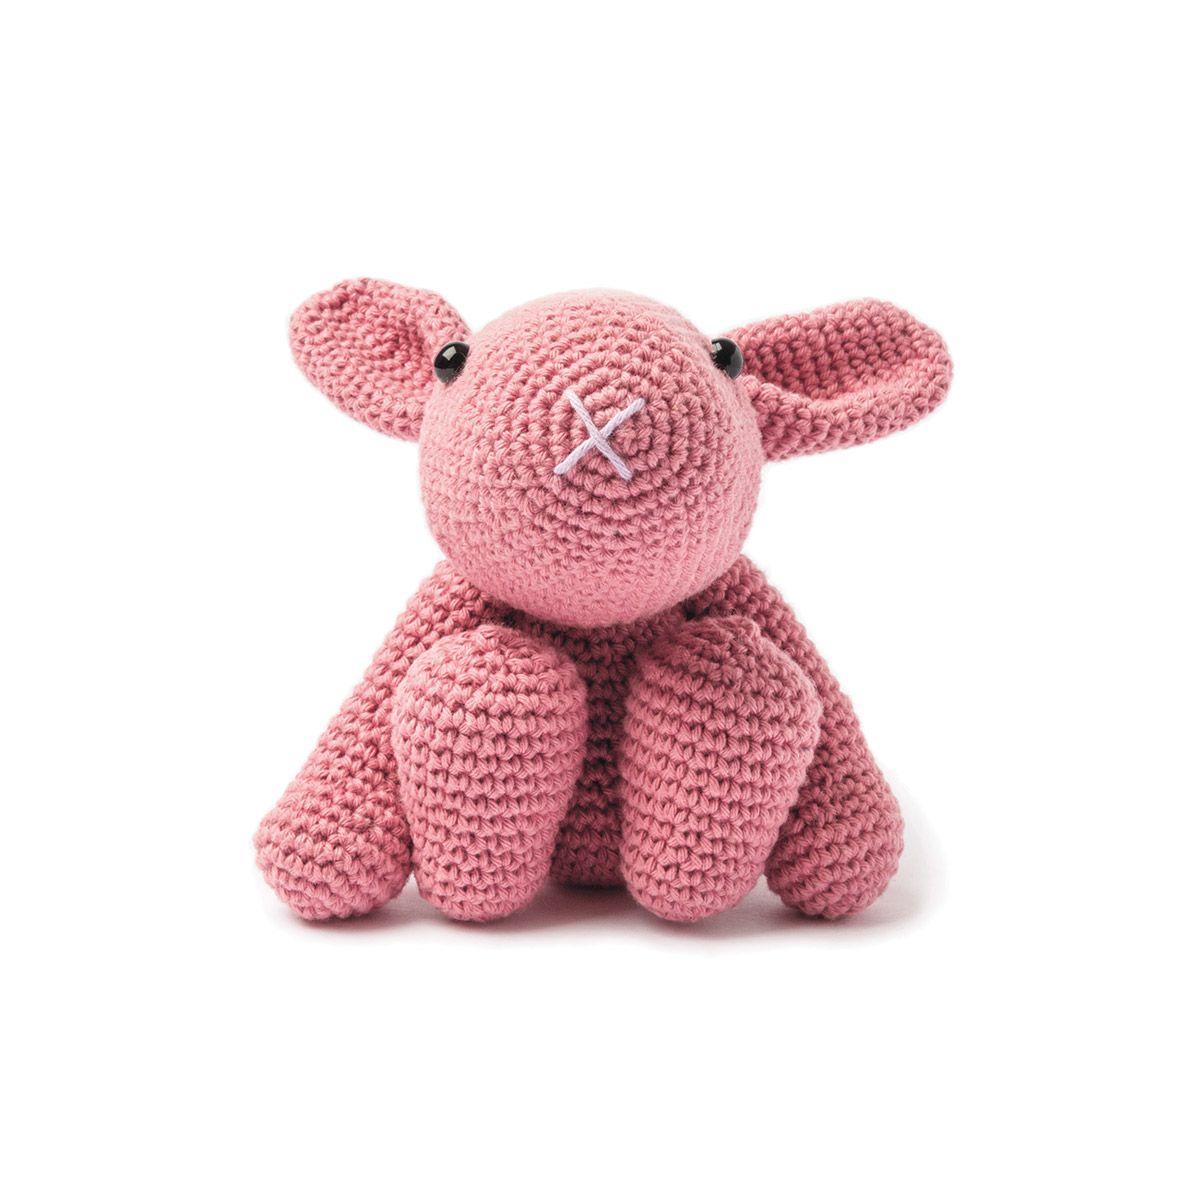 Kit crochet amigurumi - Lapin I vieux rose